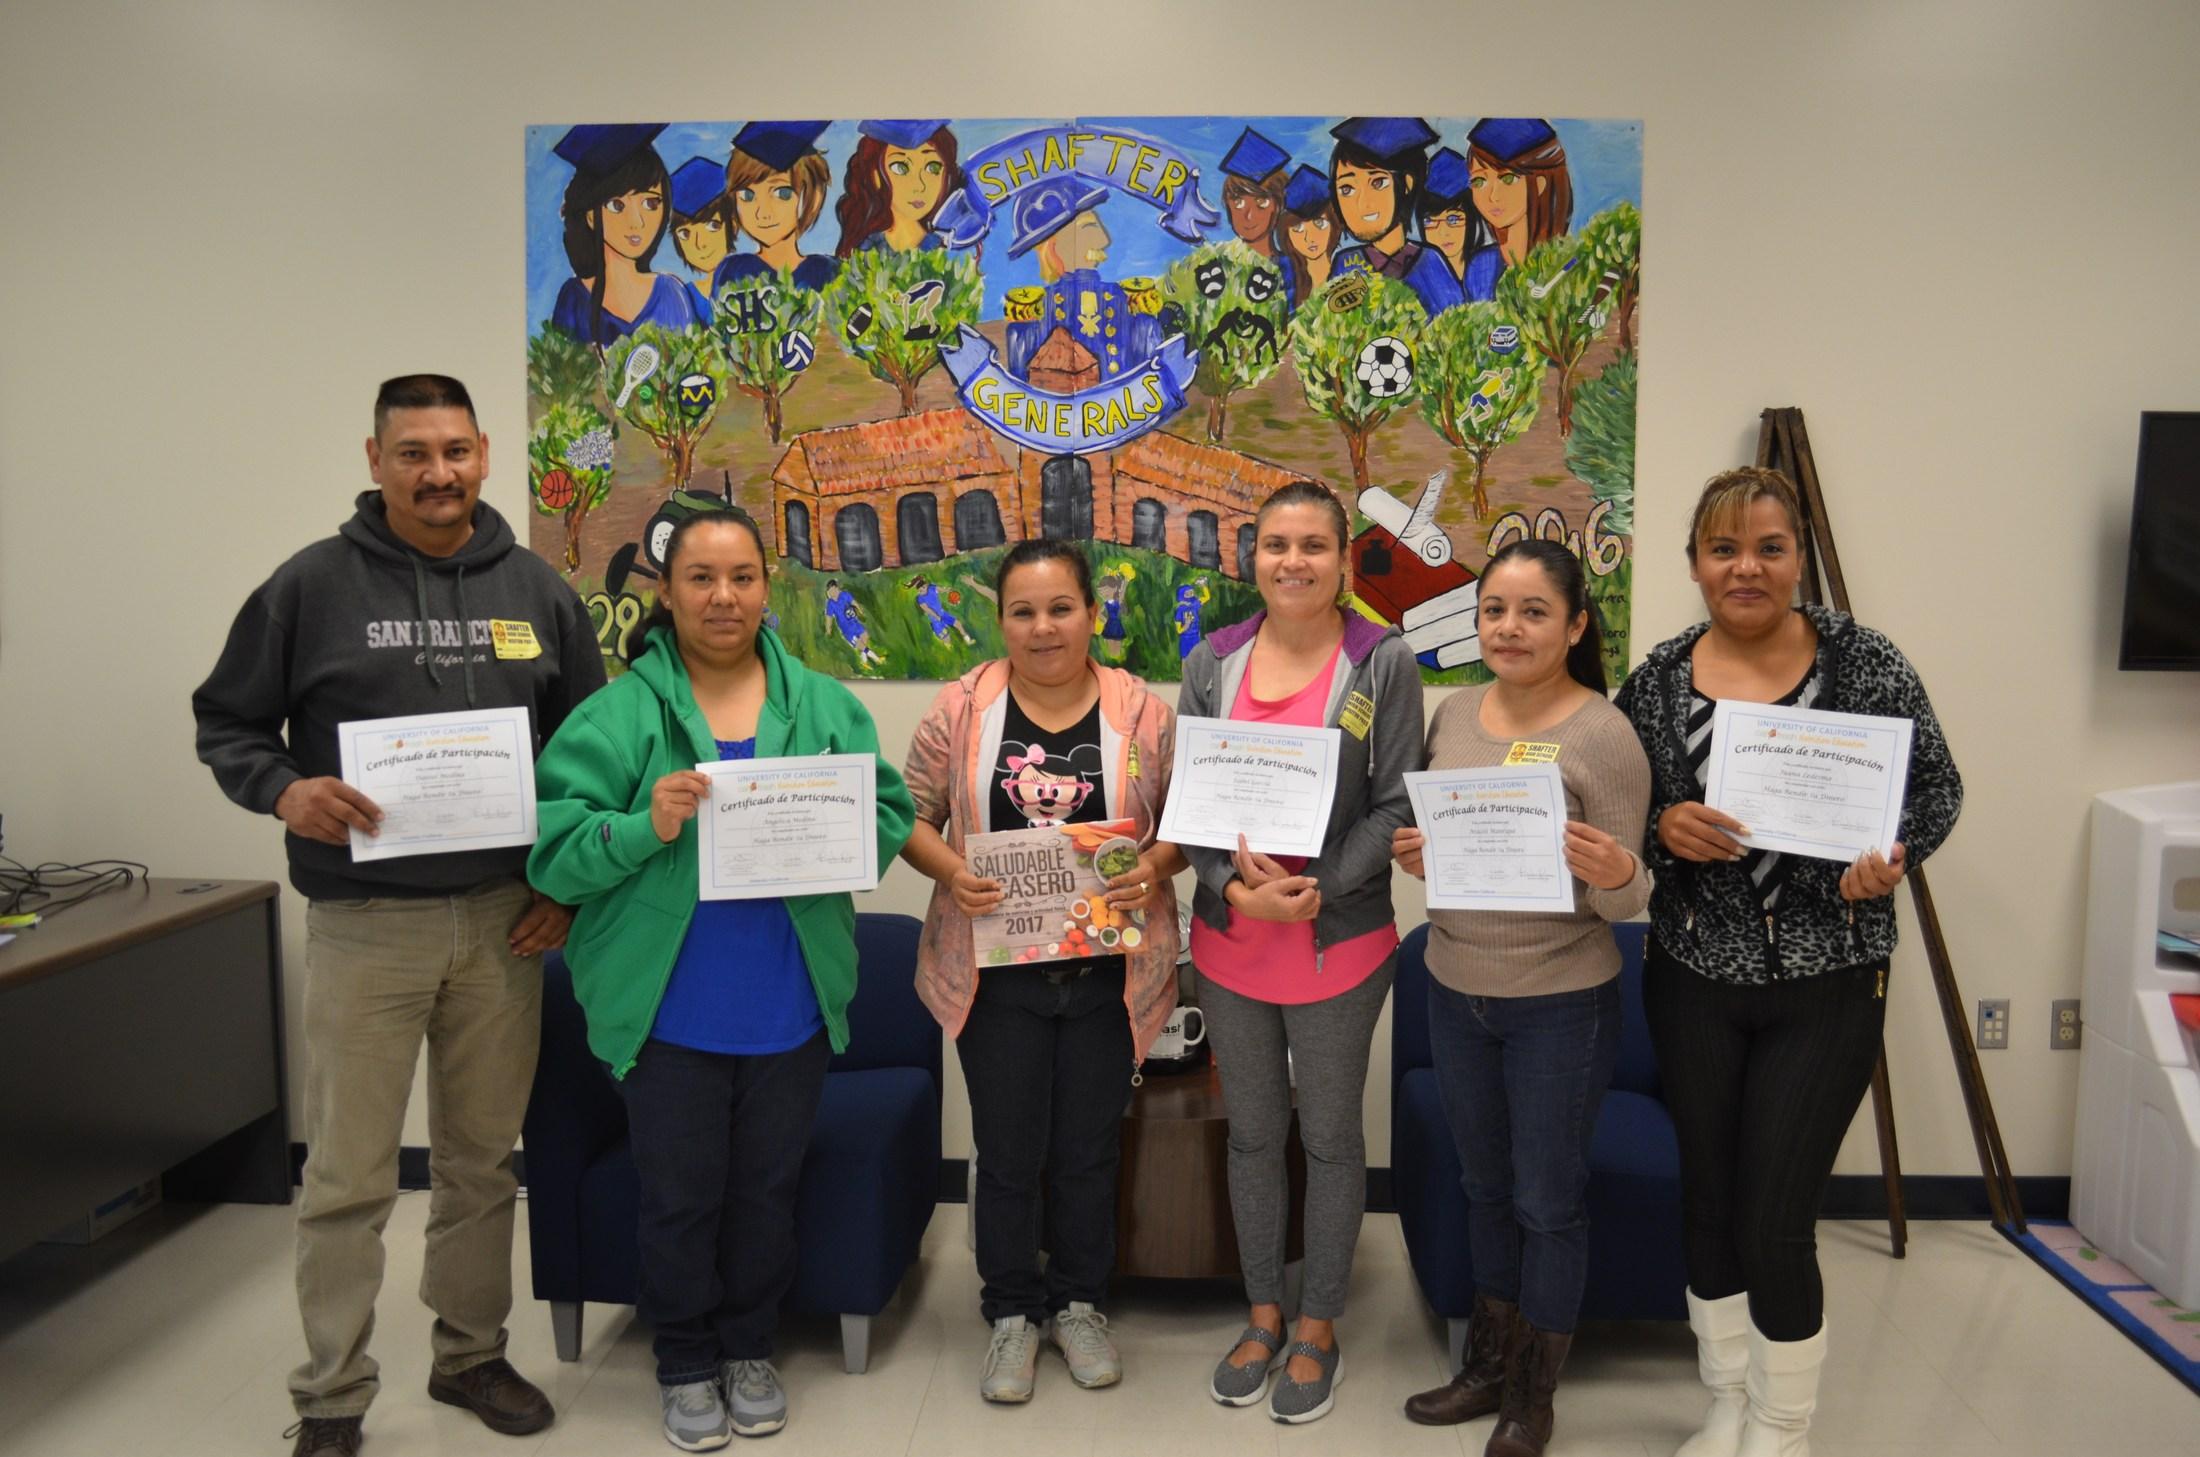 Shafter Health class graduates